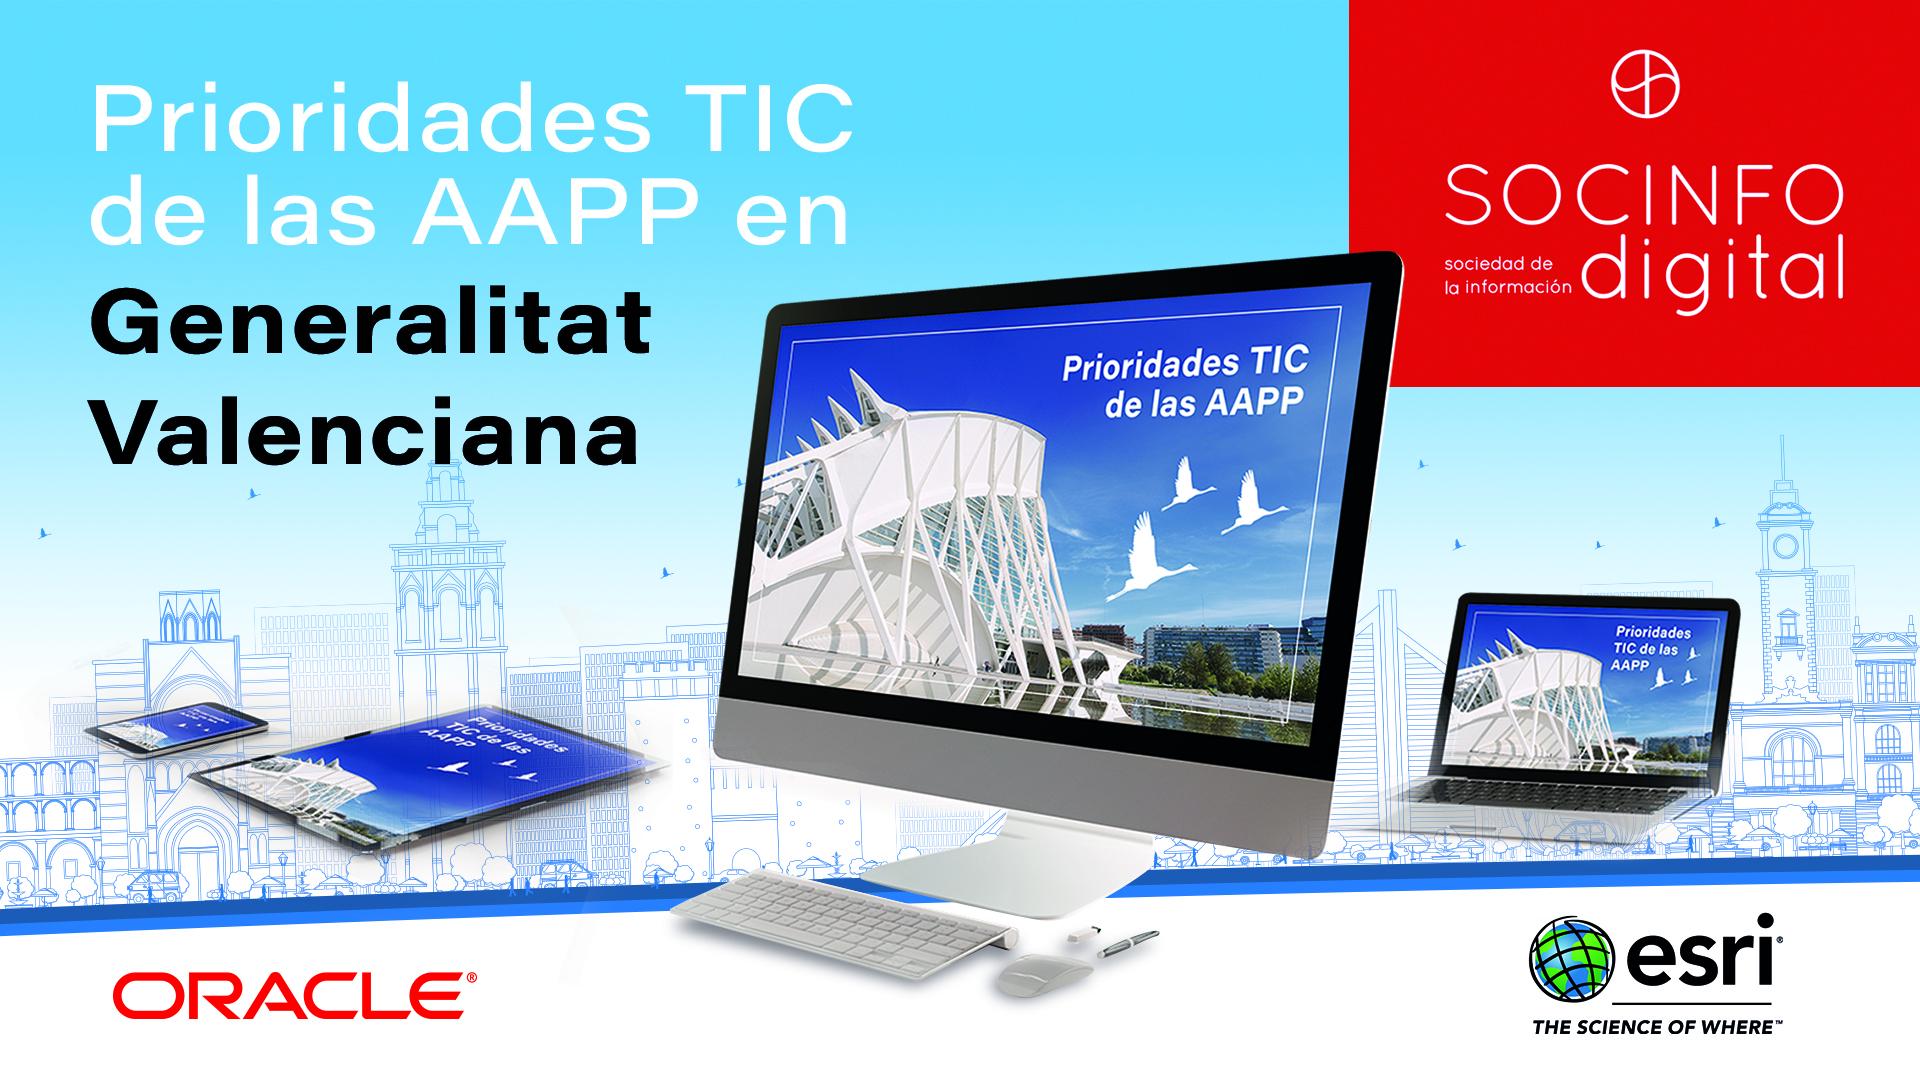 Prioridades TIC de las AAPP en la Generalitat Valenciana